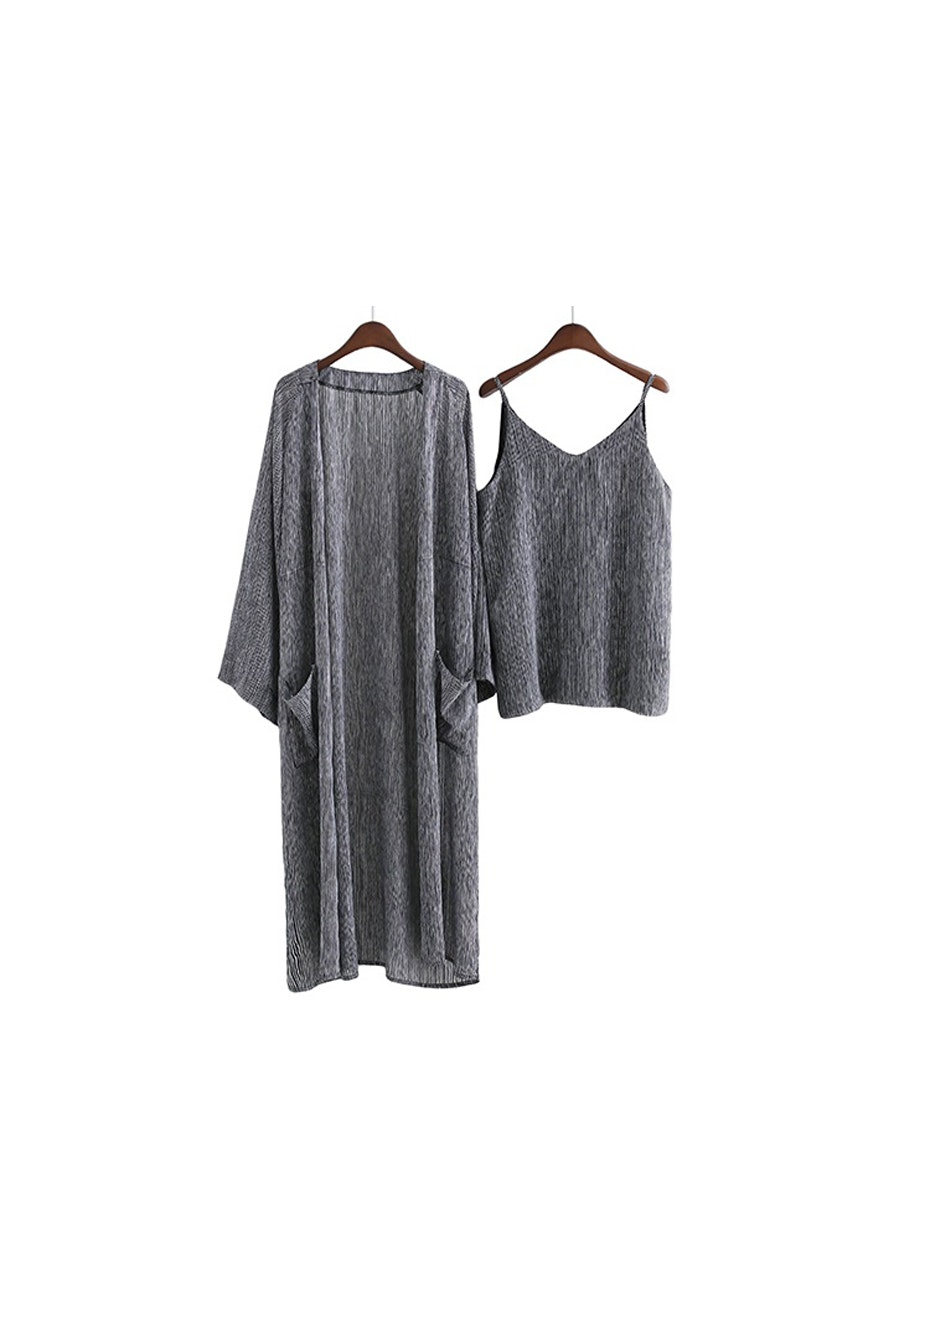 Phillip Cami + Kimono 2 Piece Set  - Peper /Salt